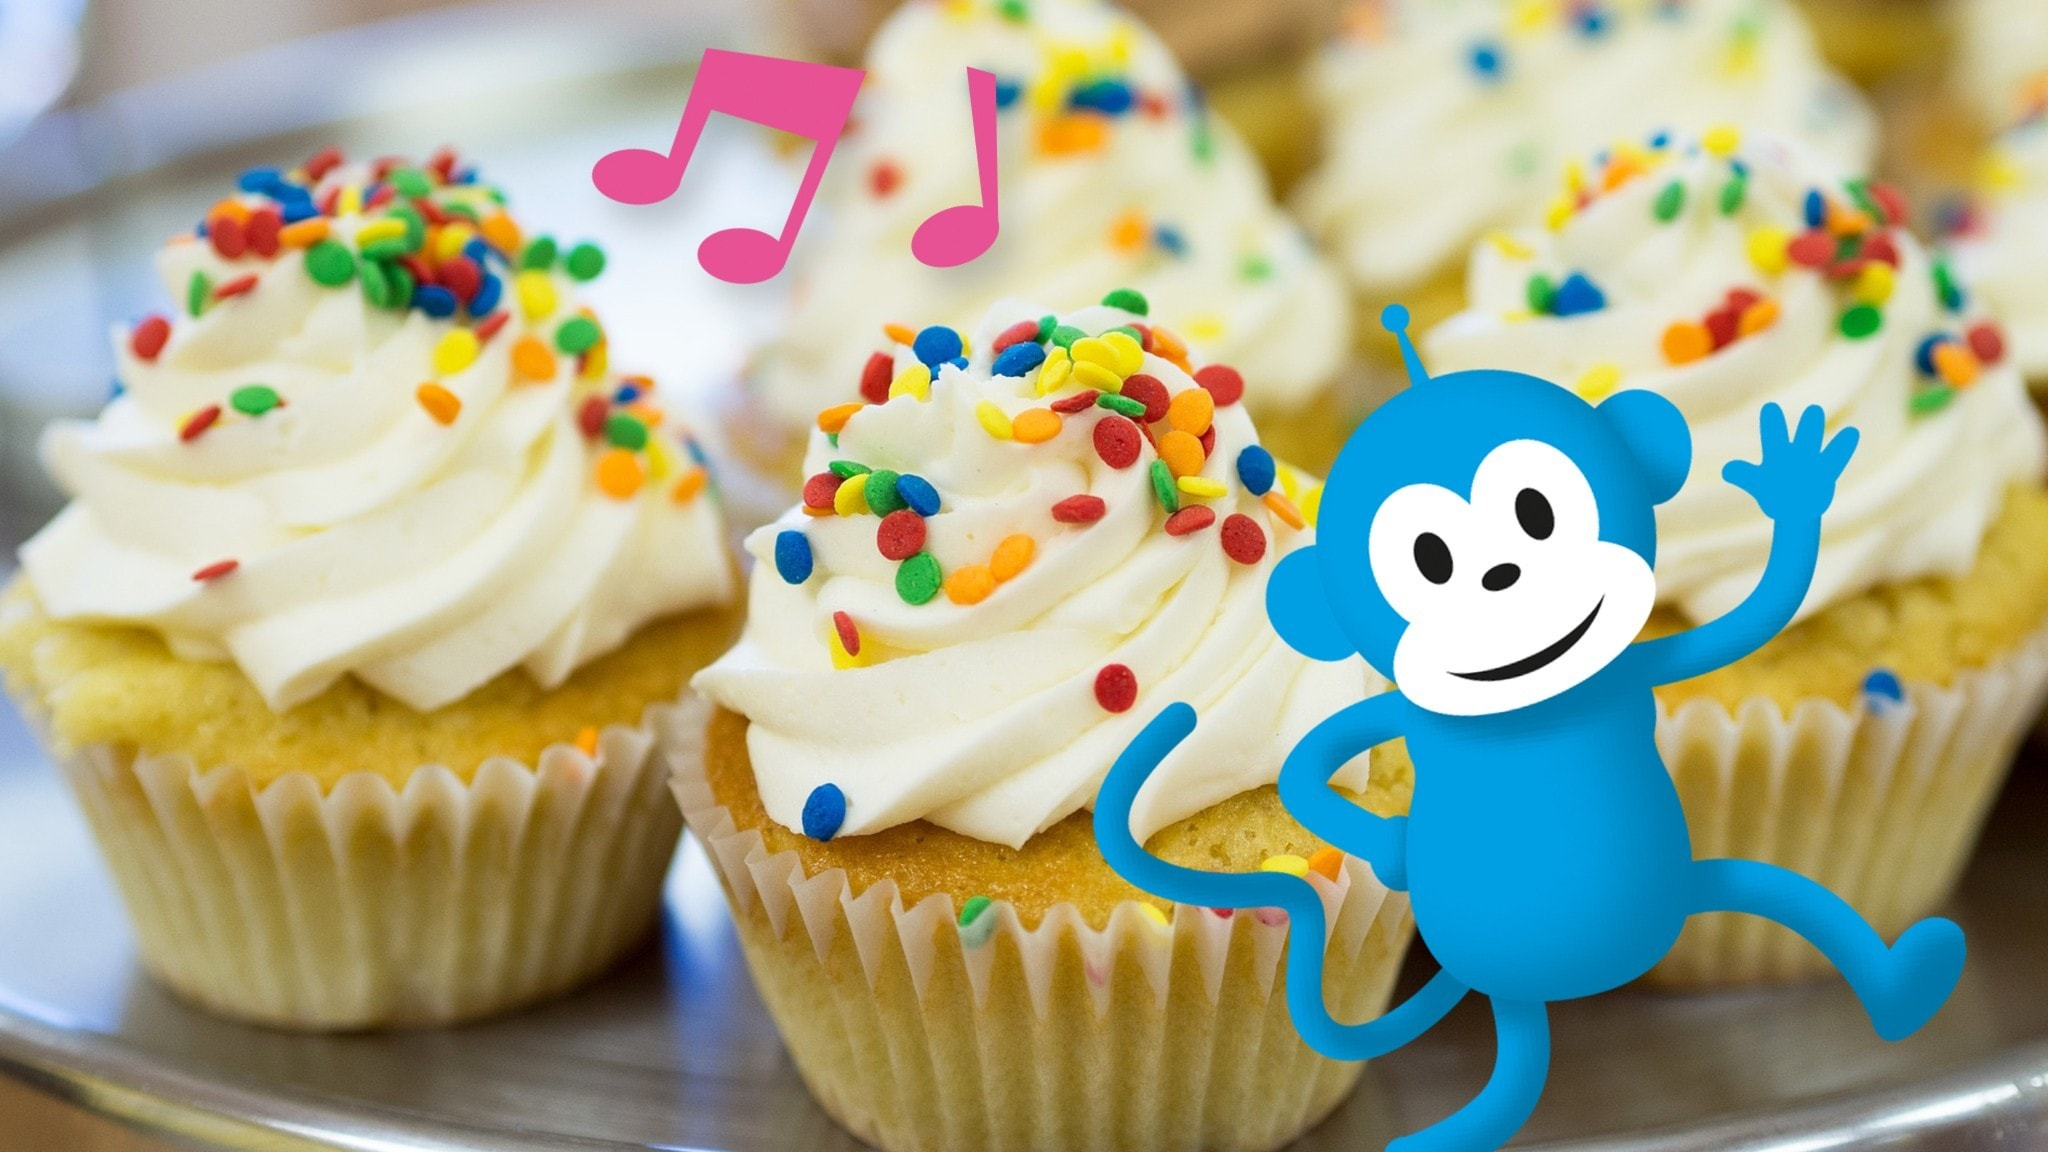 Radioapan med mumsiga cupcakes-muffins.